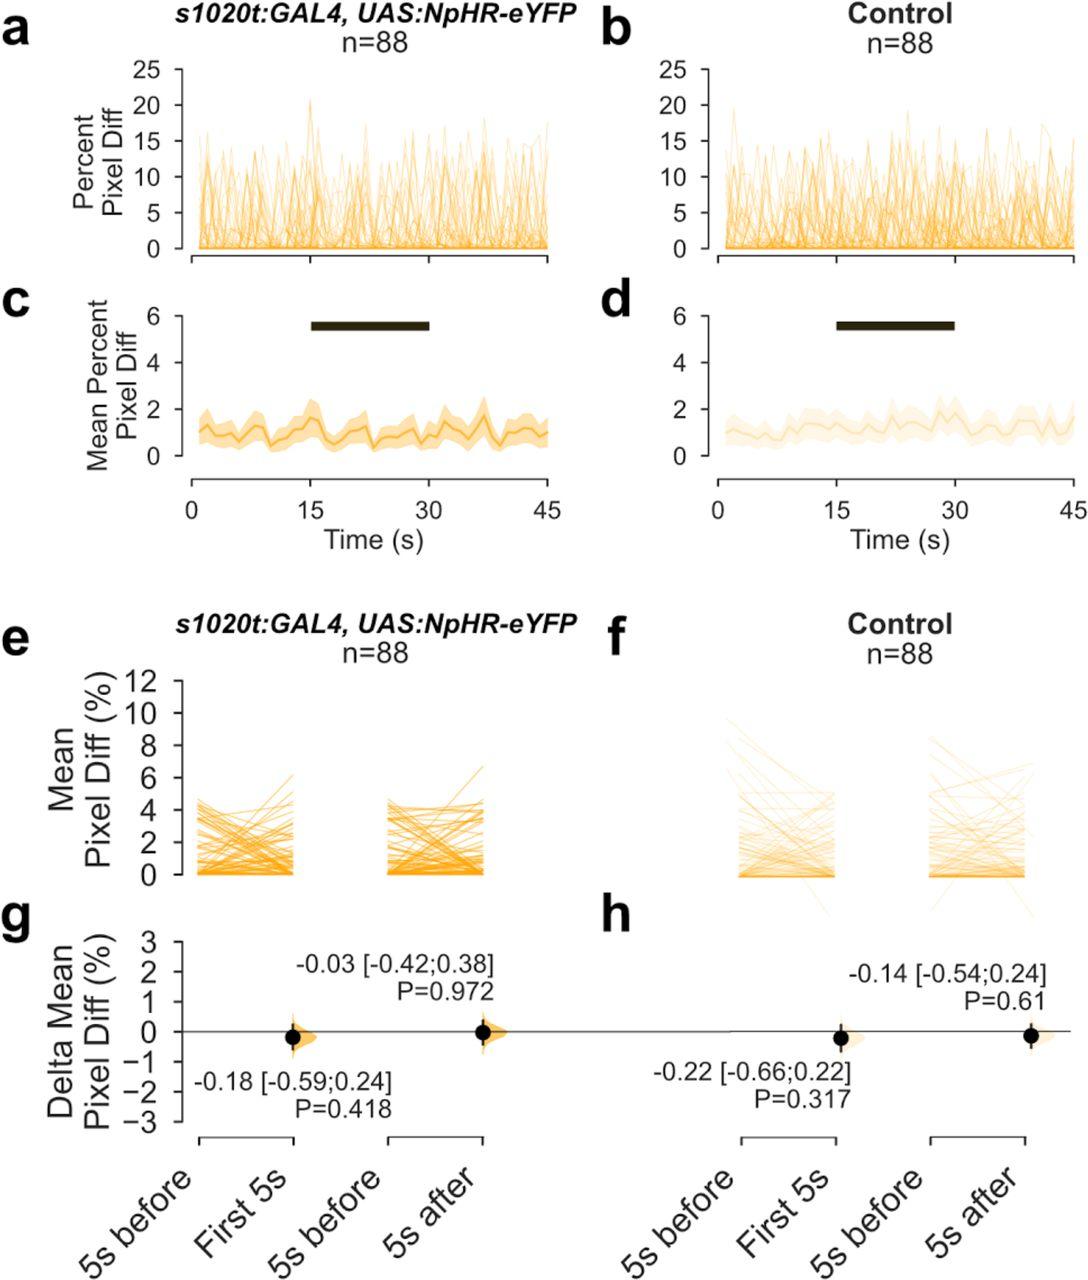 Optical inhibition of zebrafish behavior with anion